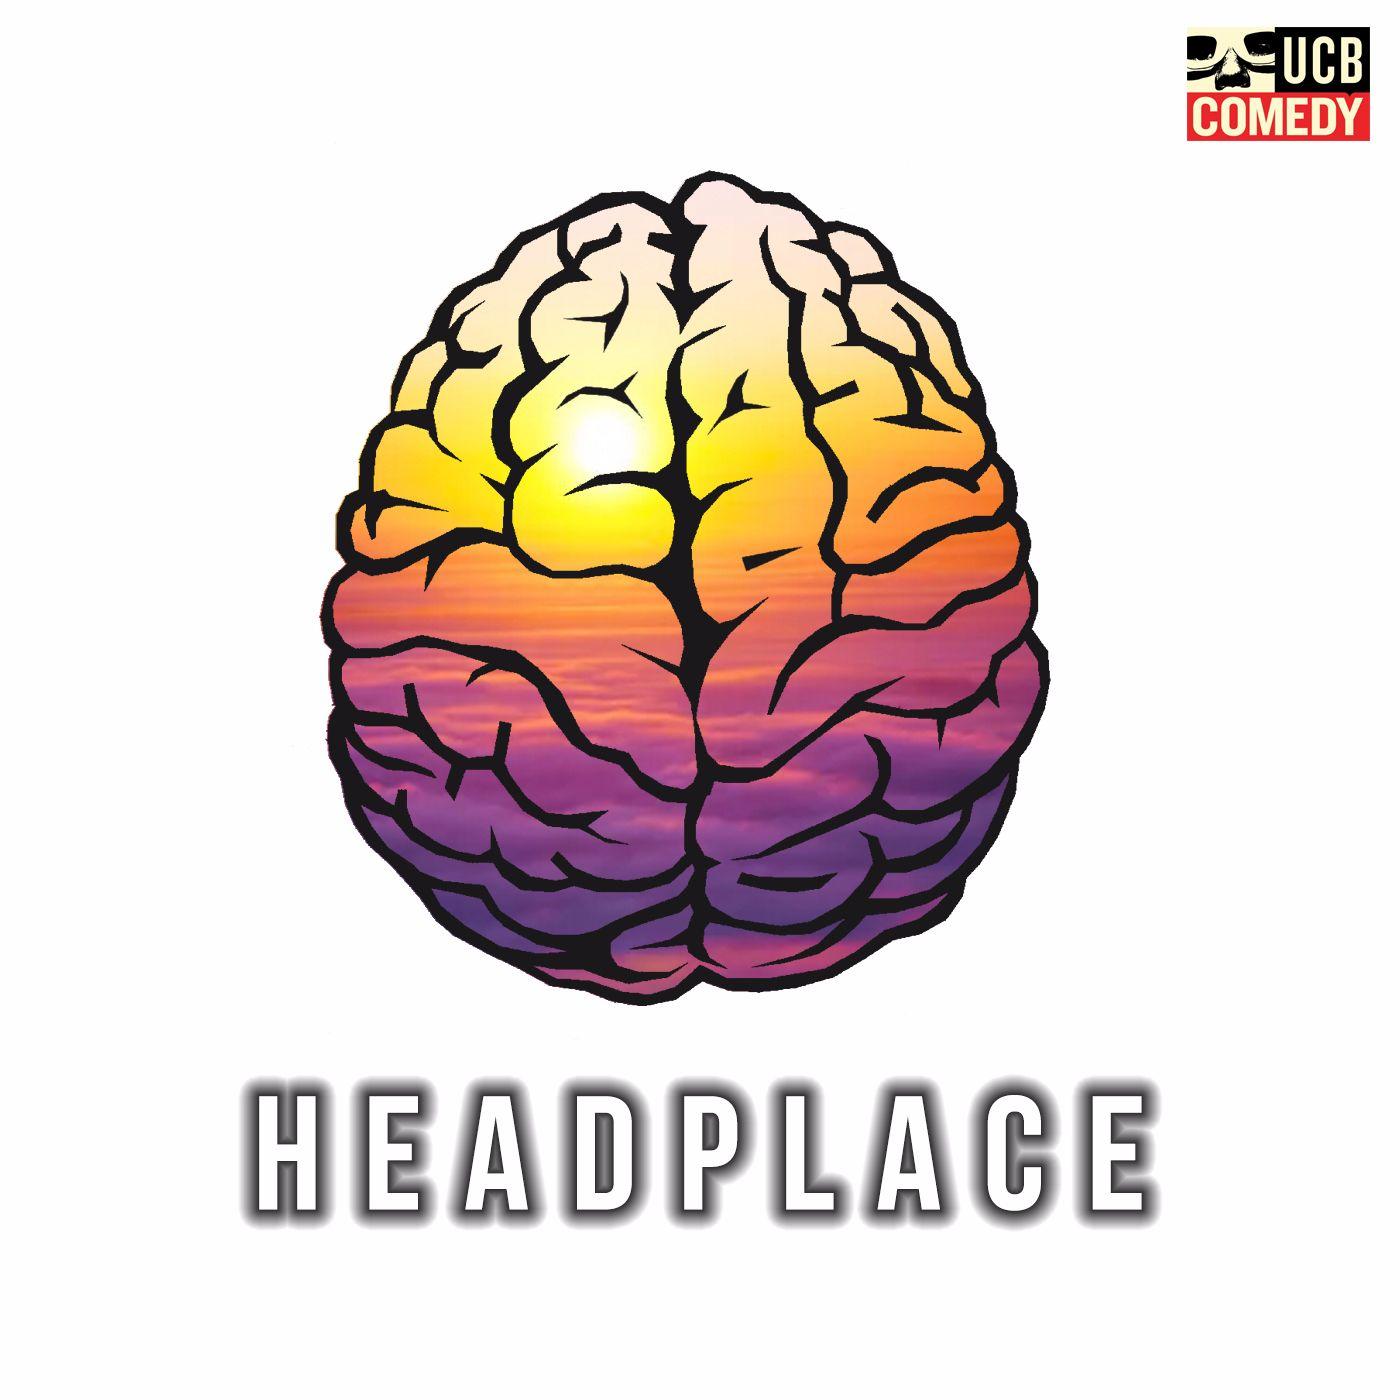 Headplace